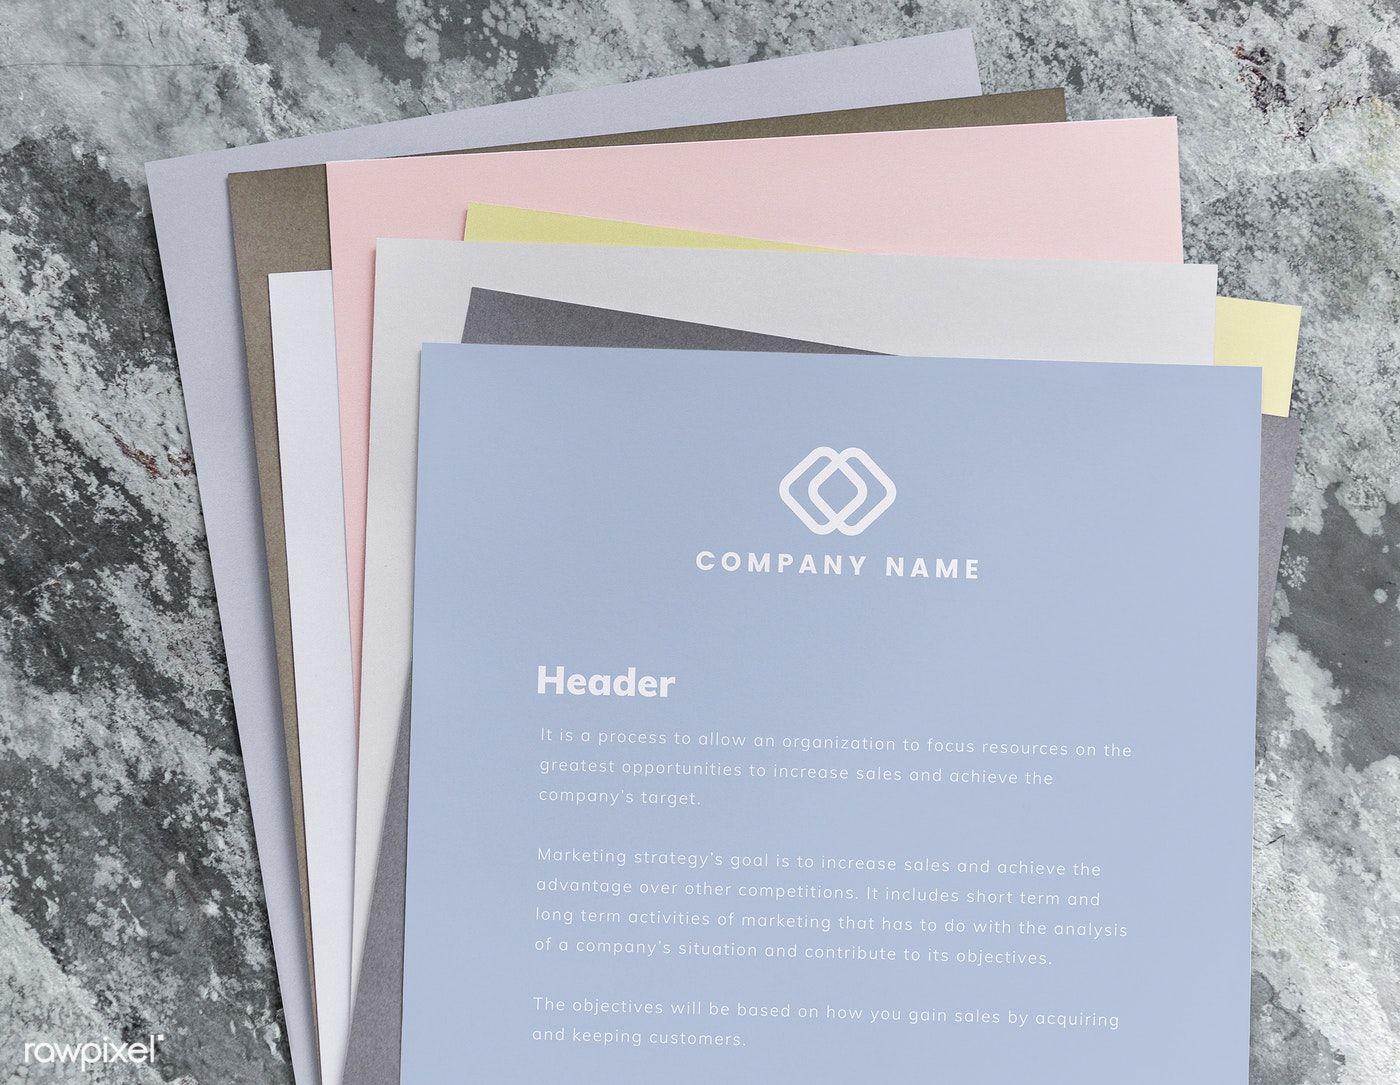 Download Premium Psd Of Stack Of Colorful Papers Mockup 531974 Paper Mockup Business Card Mock Up Brochure Design Template